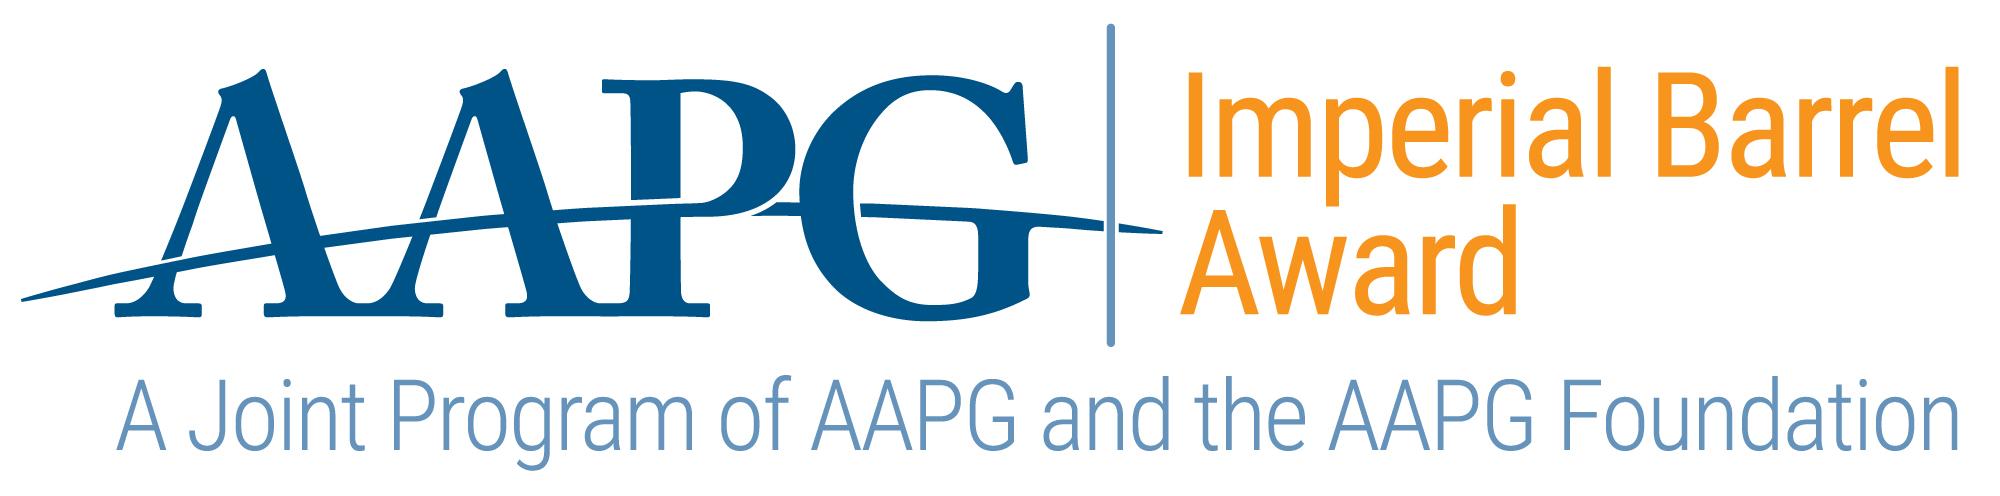 aapg imperial barrel award program